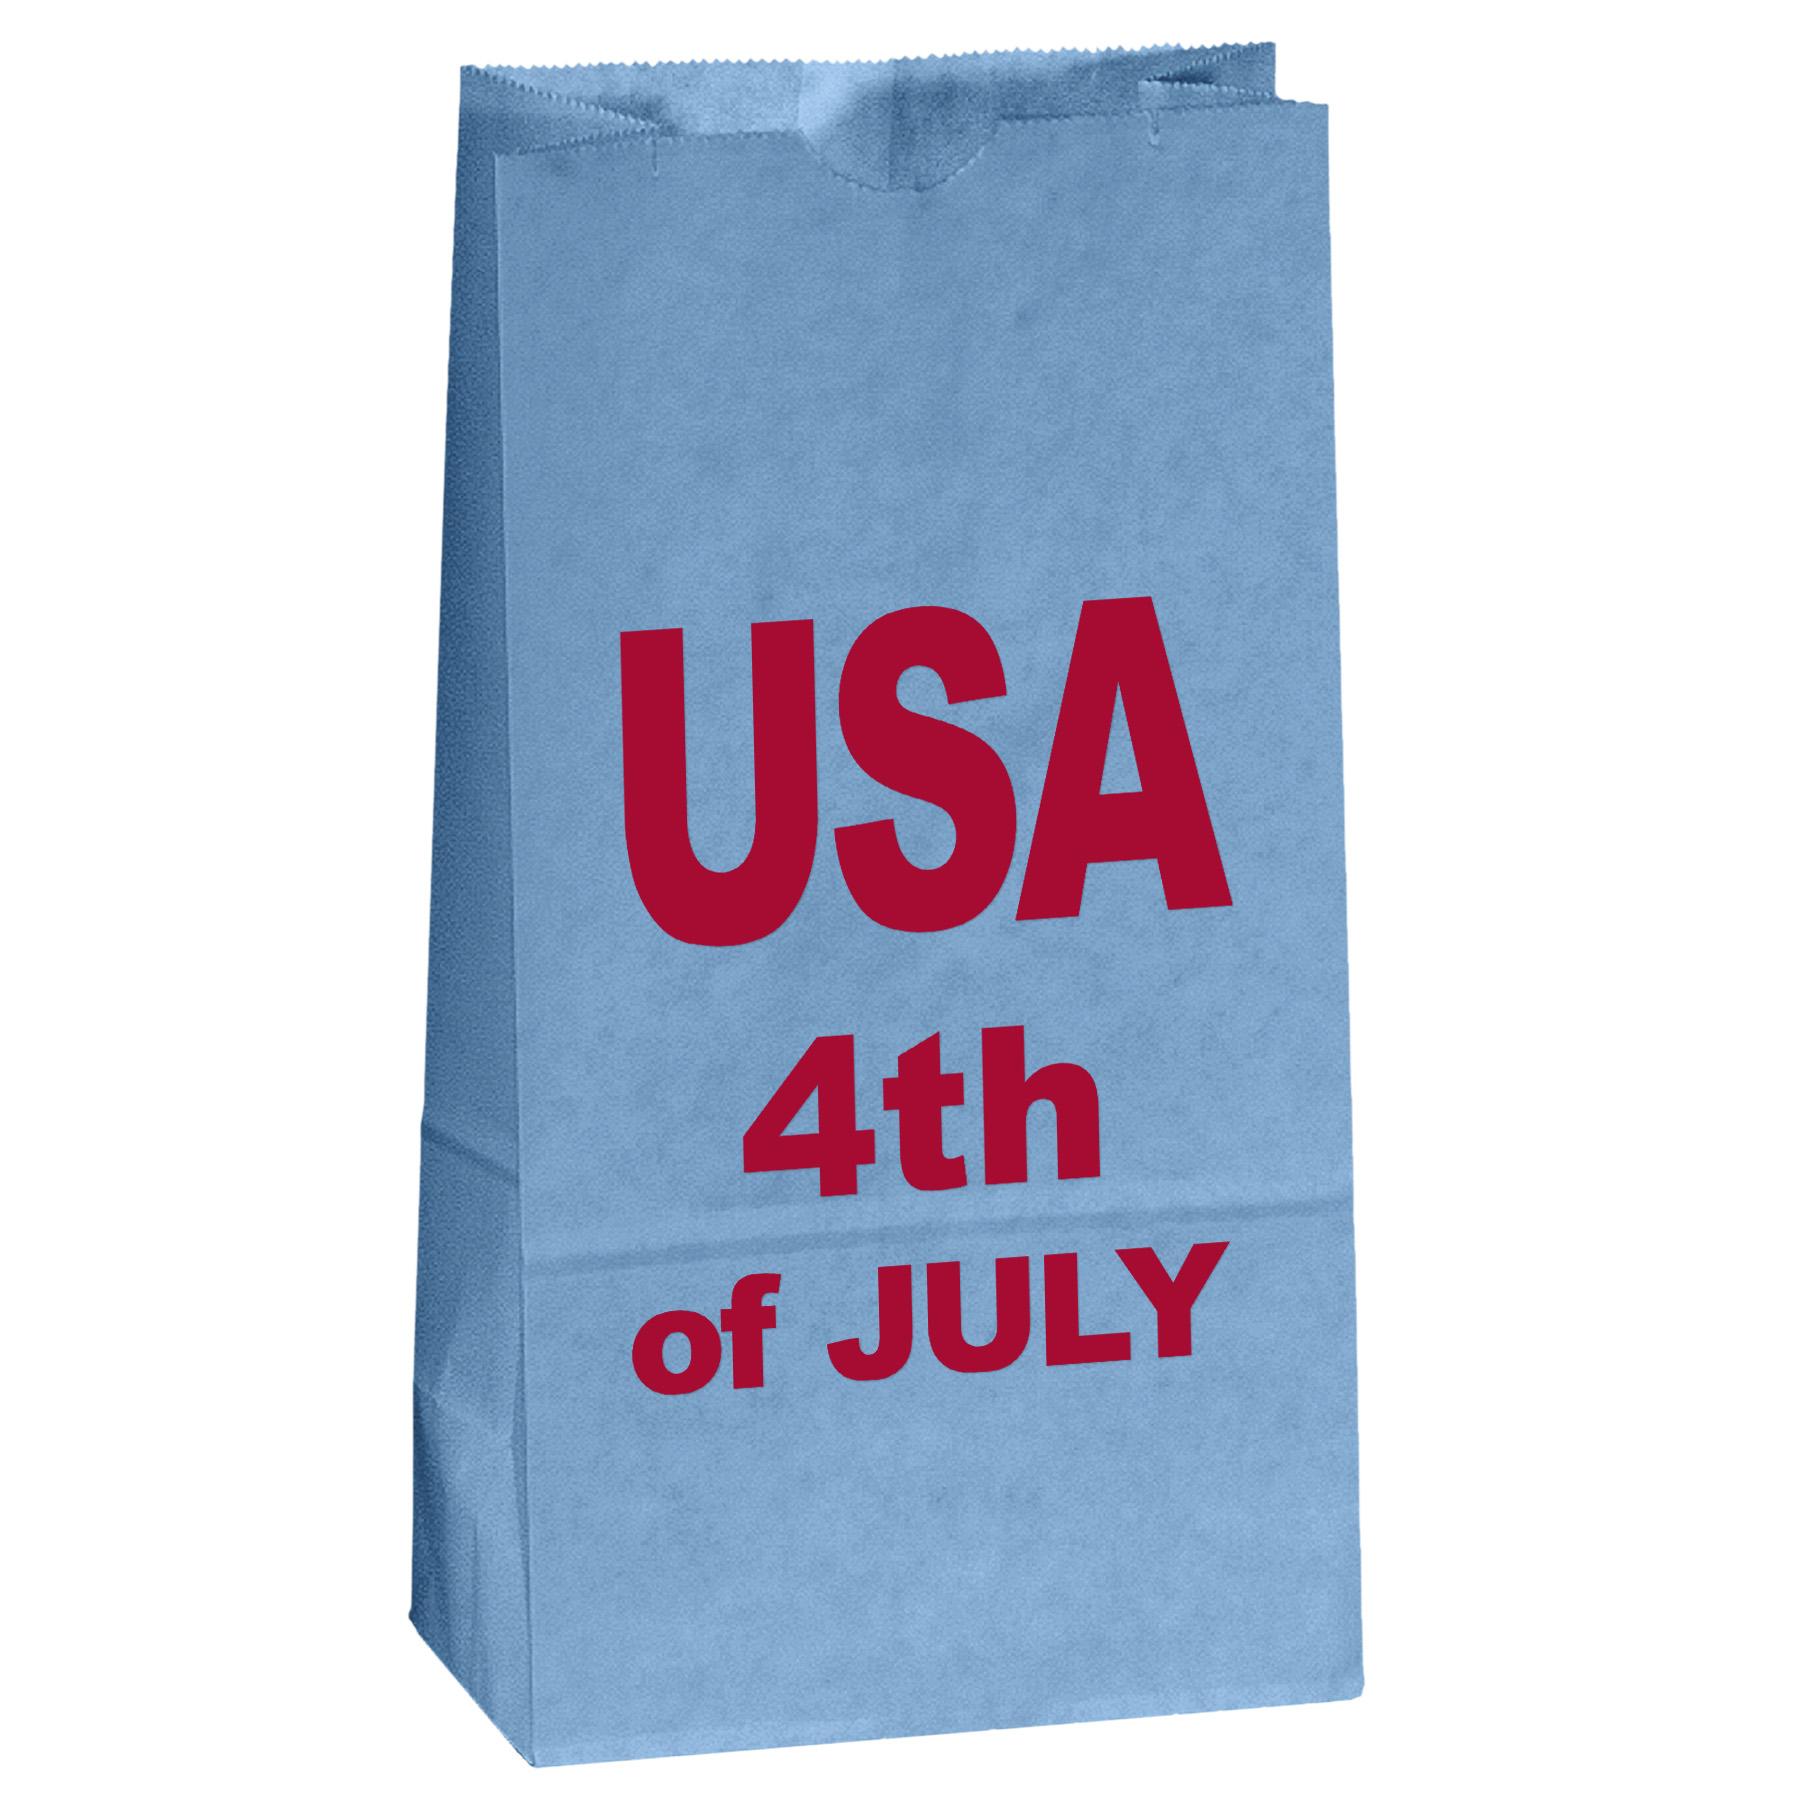 Popcorn Bag - Colored Bag (Brilliance- Matte Finish)